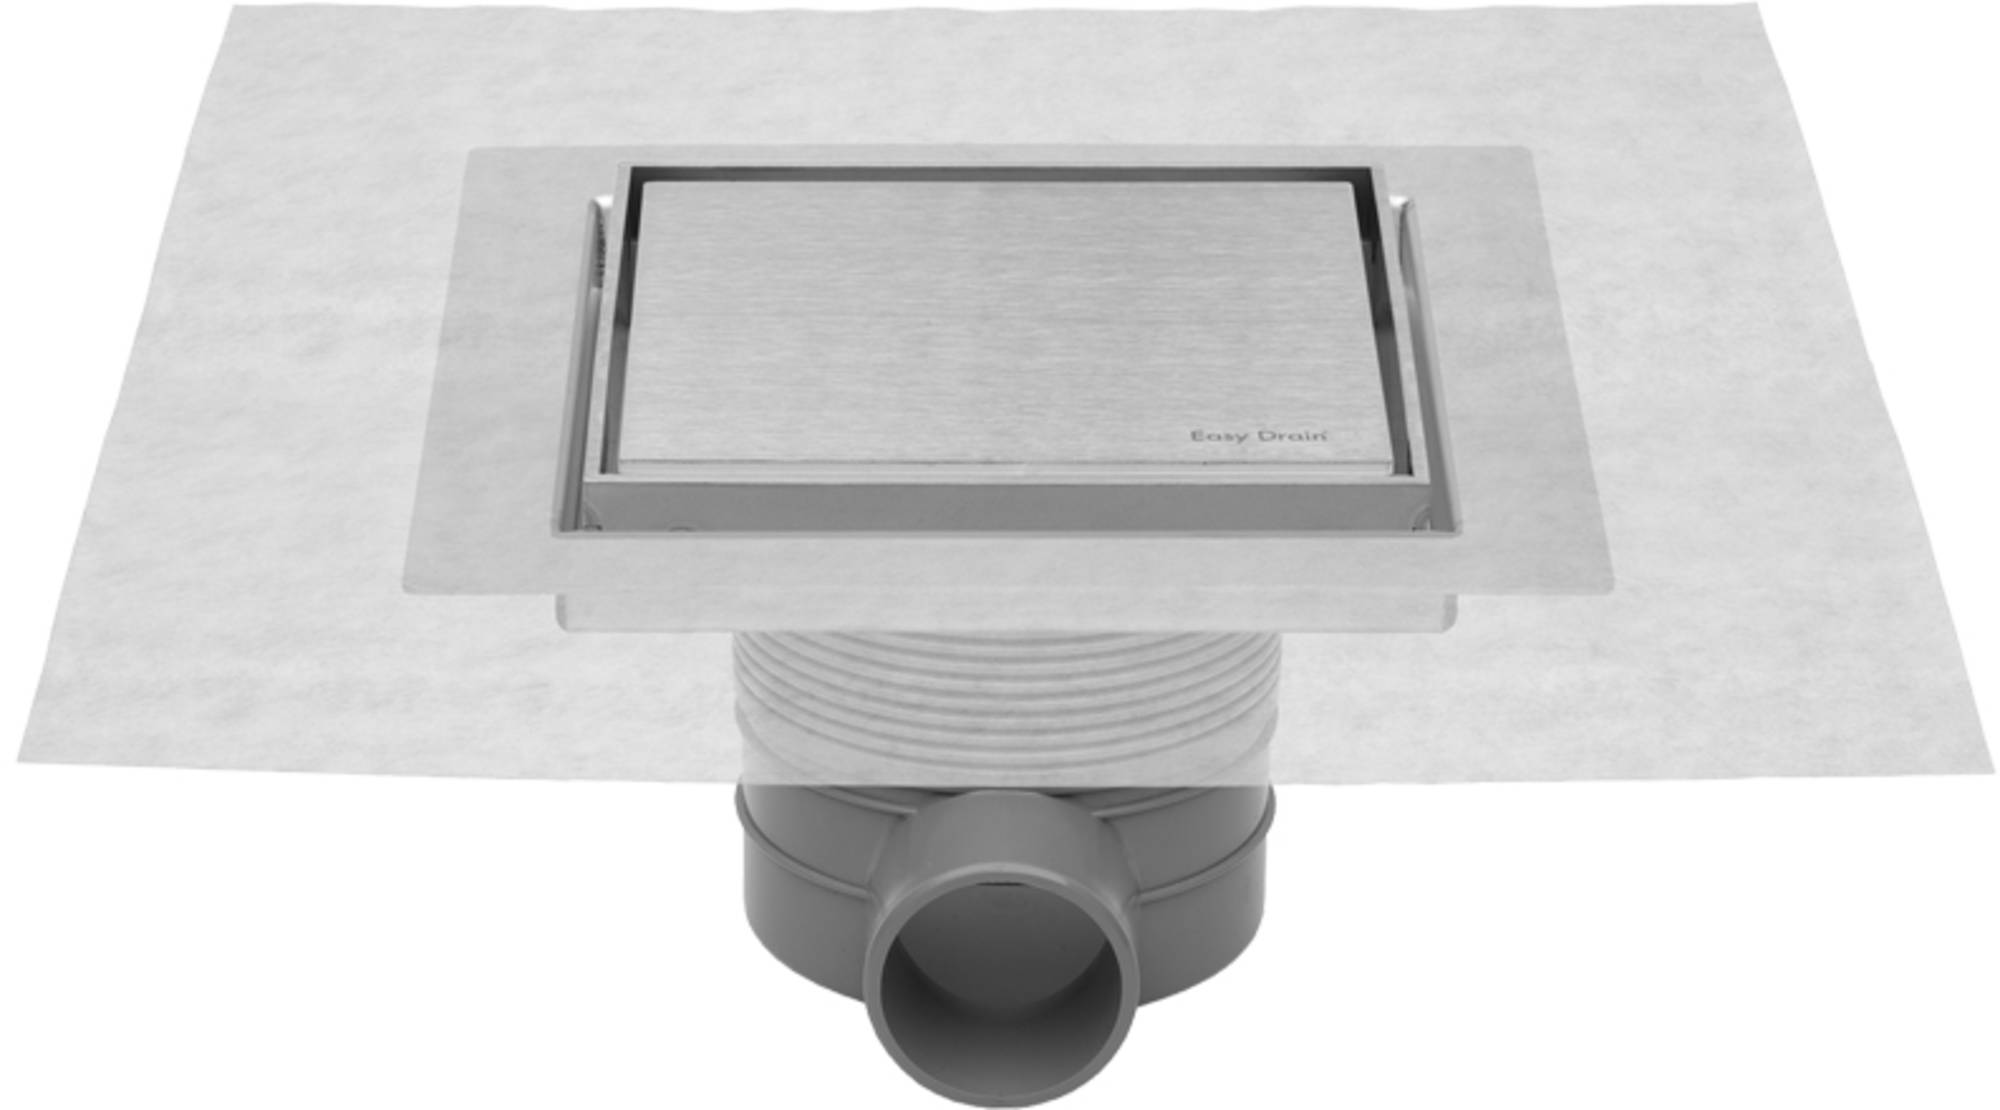 Easydrain Aqua jewels quattro vloerput rvs 15x15 cm, zu multi, rvs geborsteld